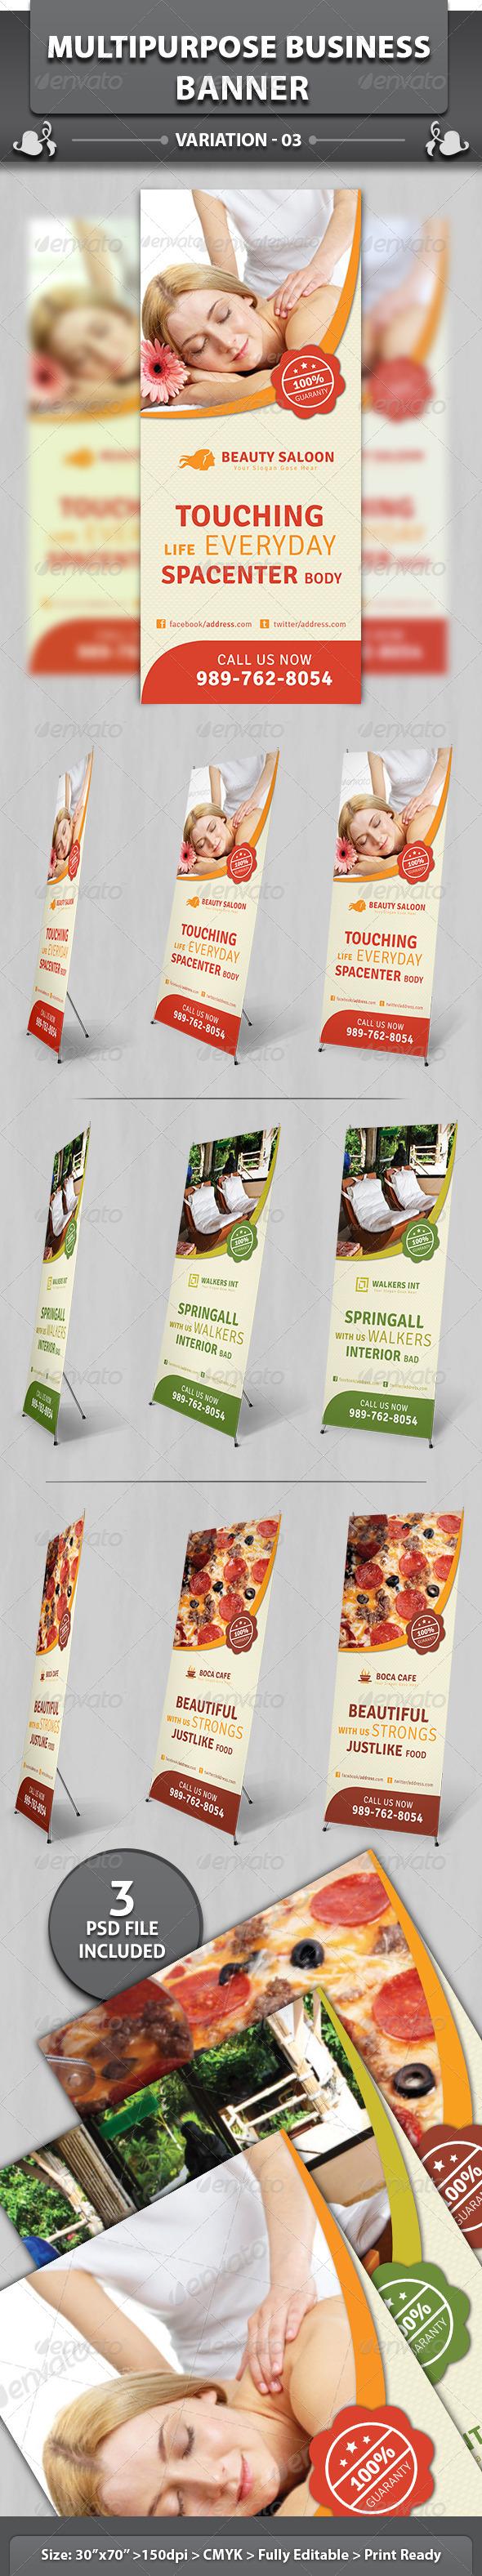 Multipurpose Business Banner | Volume 3 - Signage Print Templates